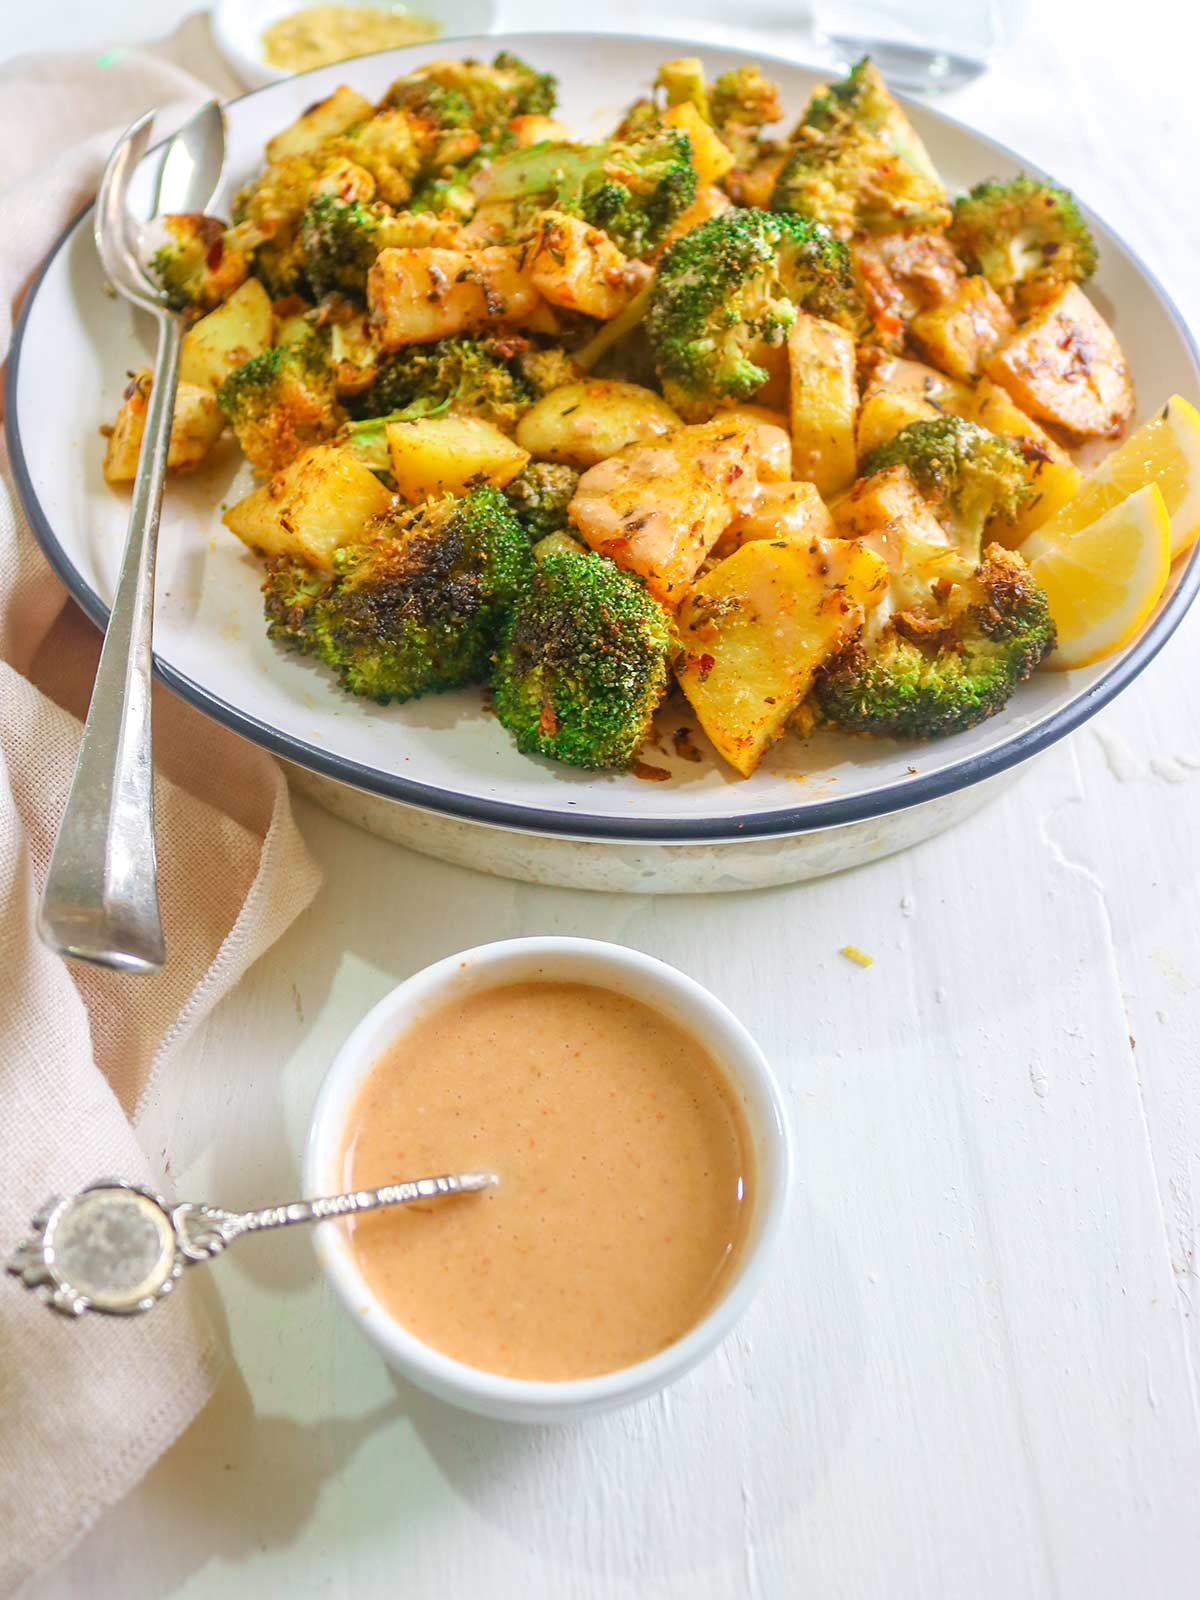 roasted veggies with tahini sauce